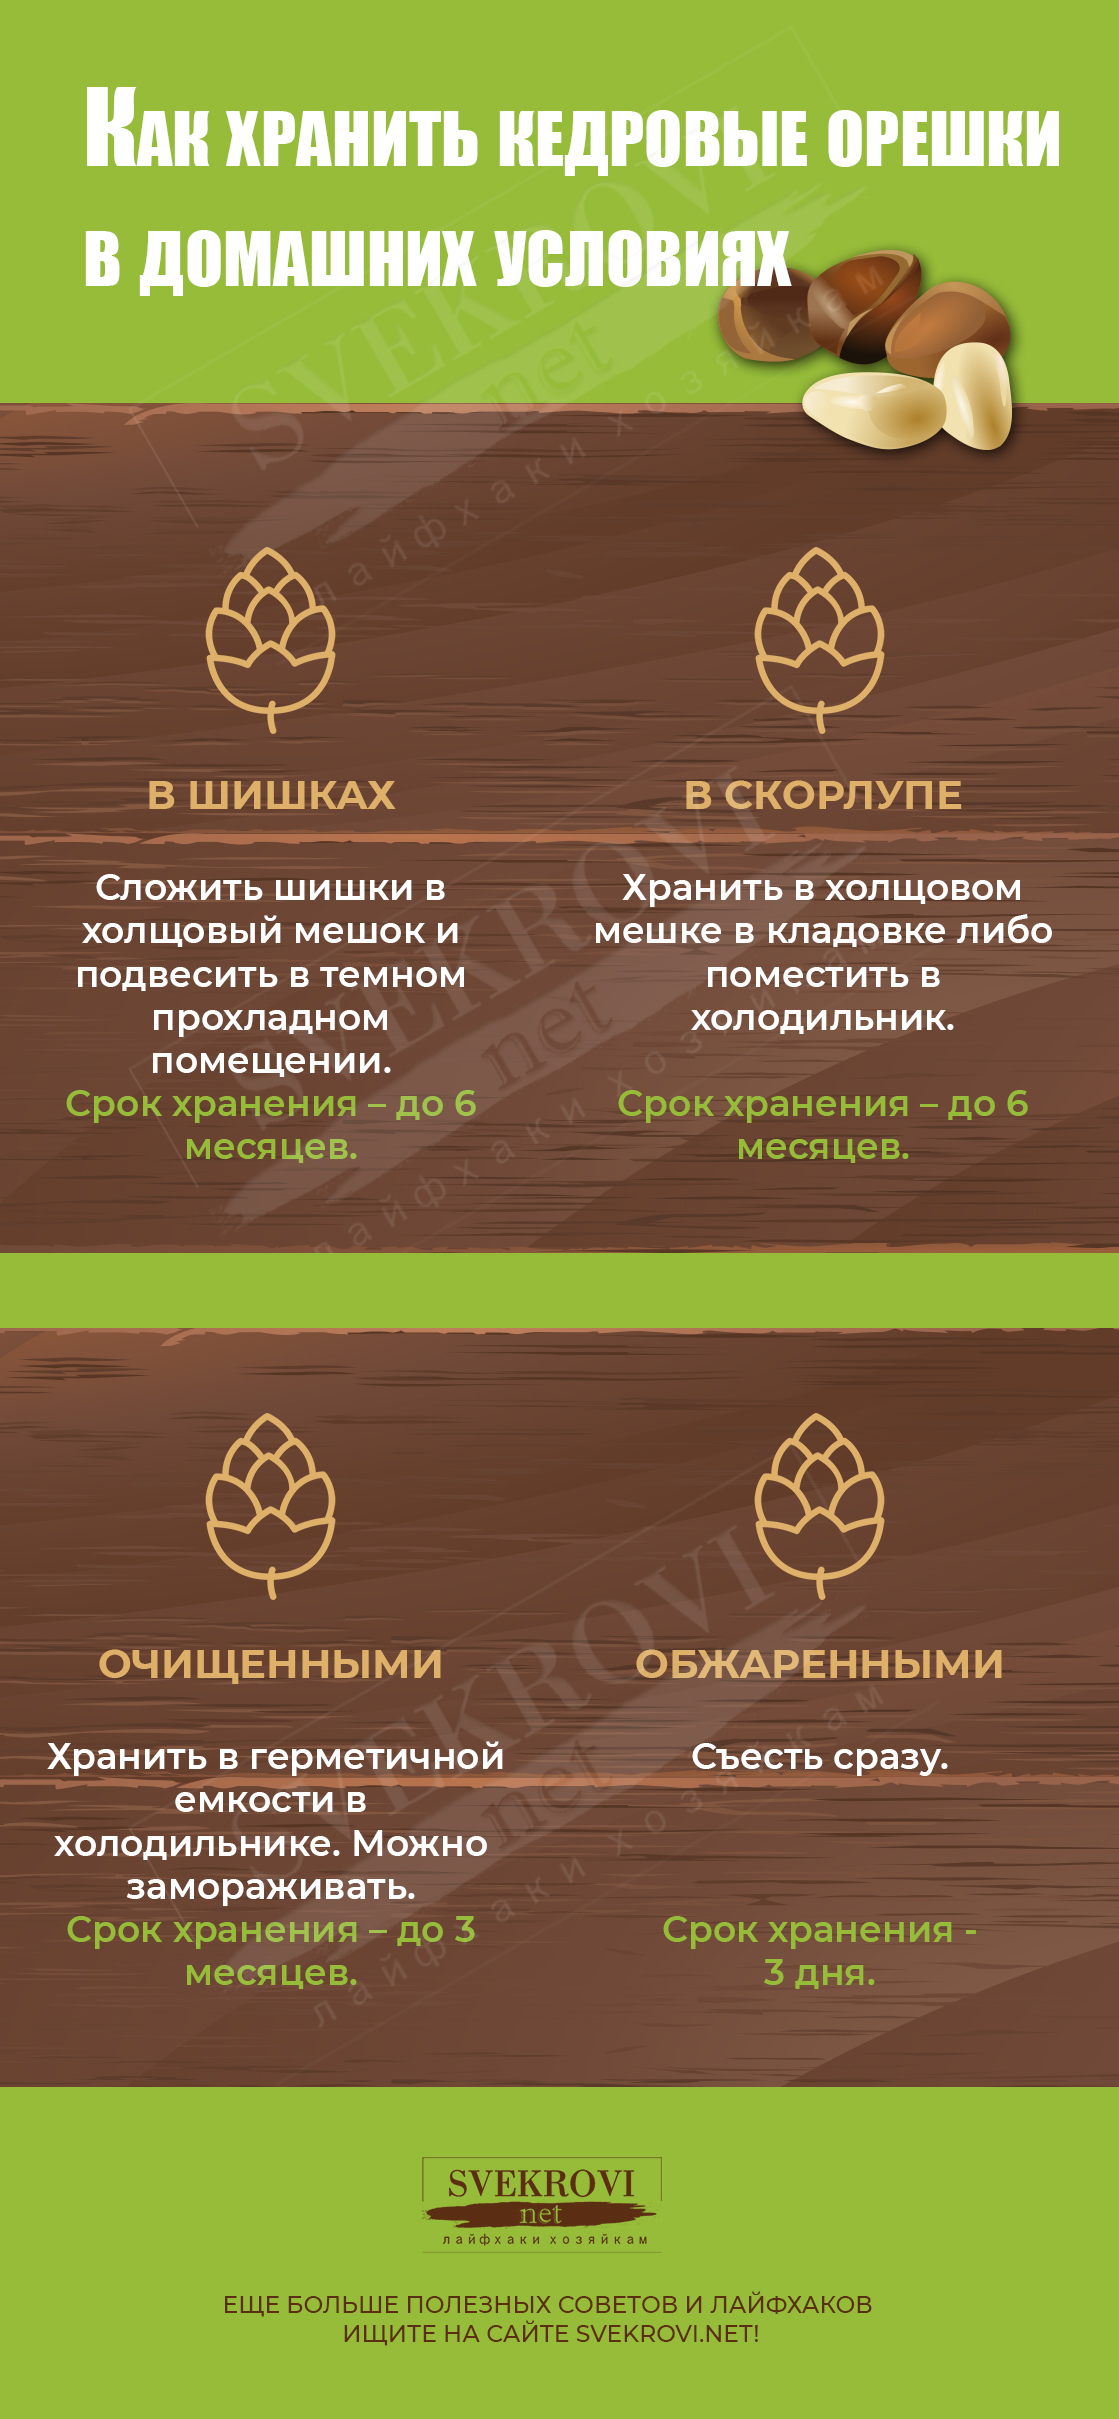 Хранение кедровых семян